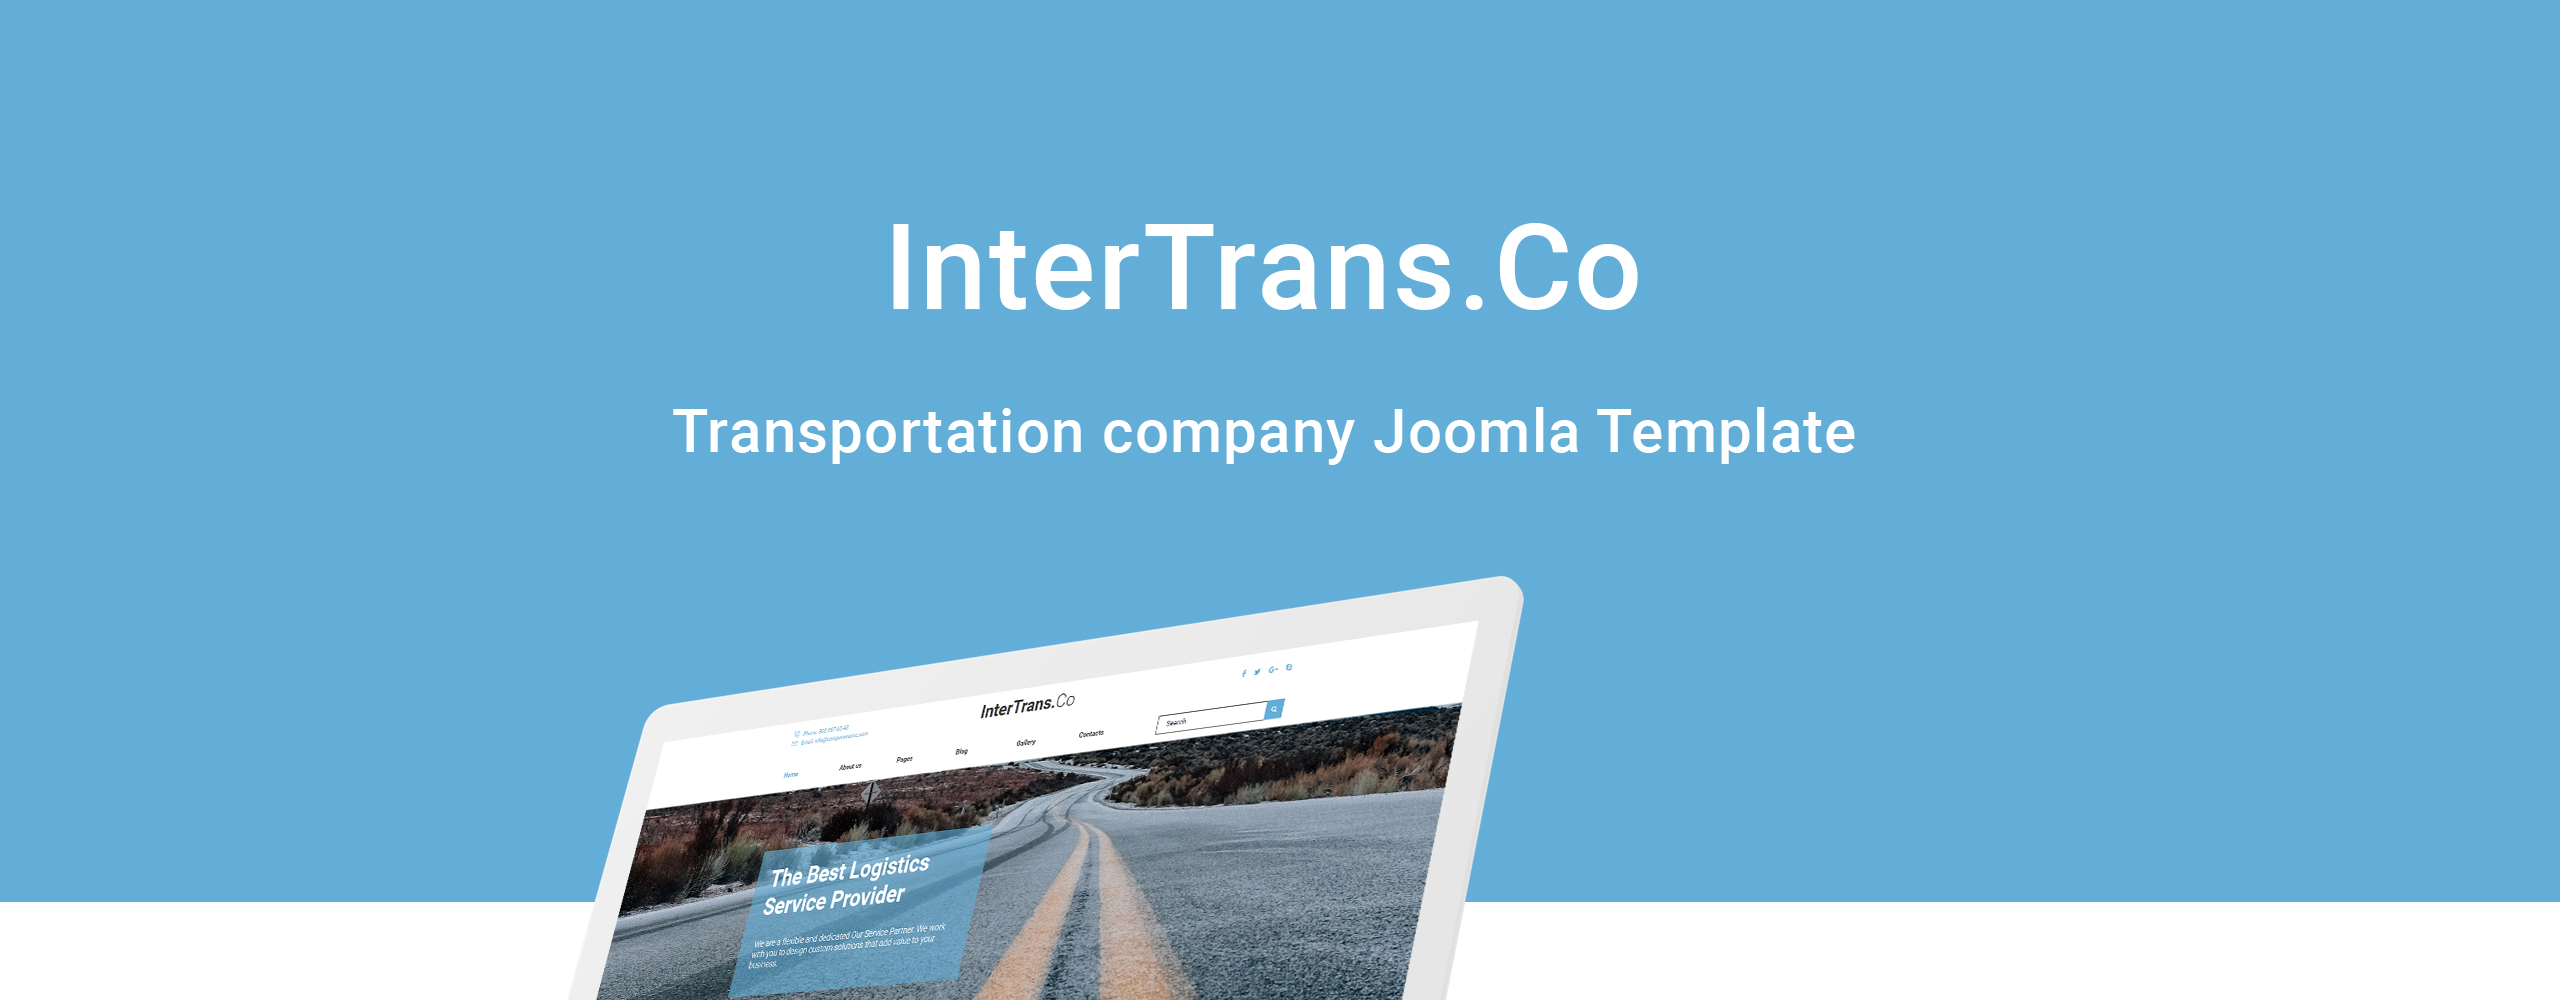 Website Design Template 74418 - joomla logistics transportationundefined